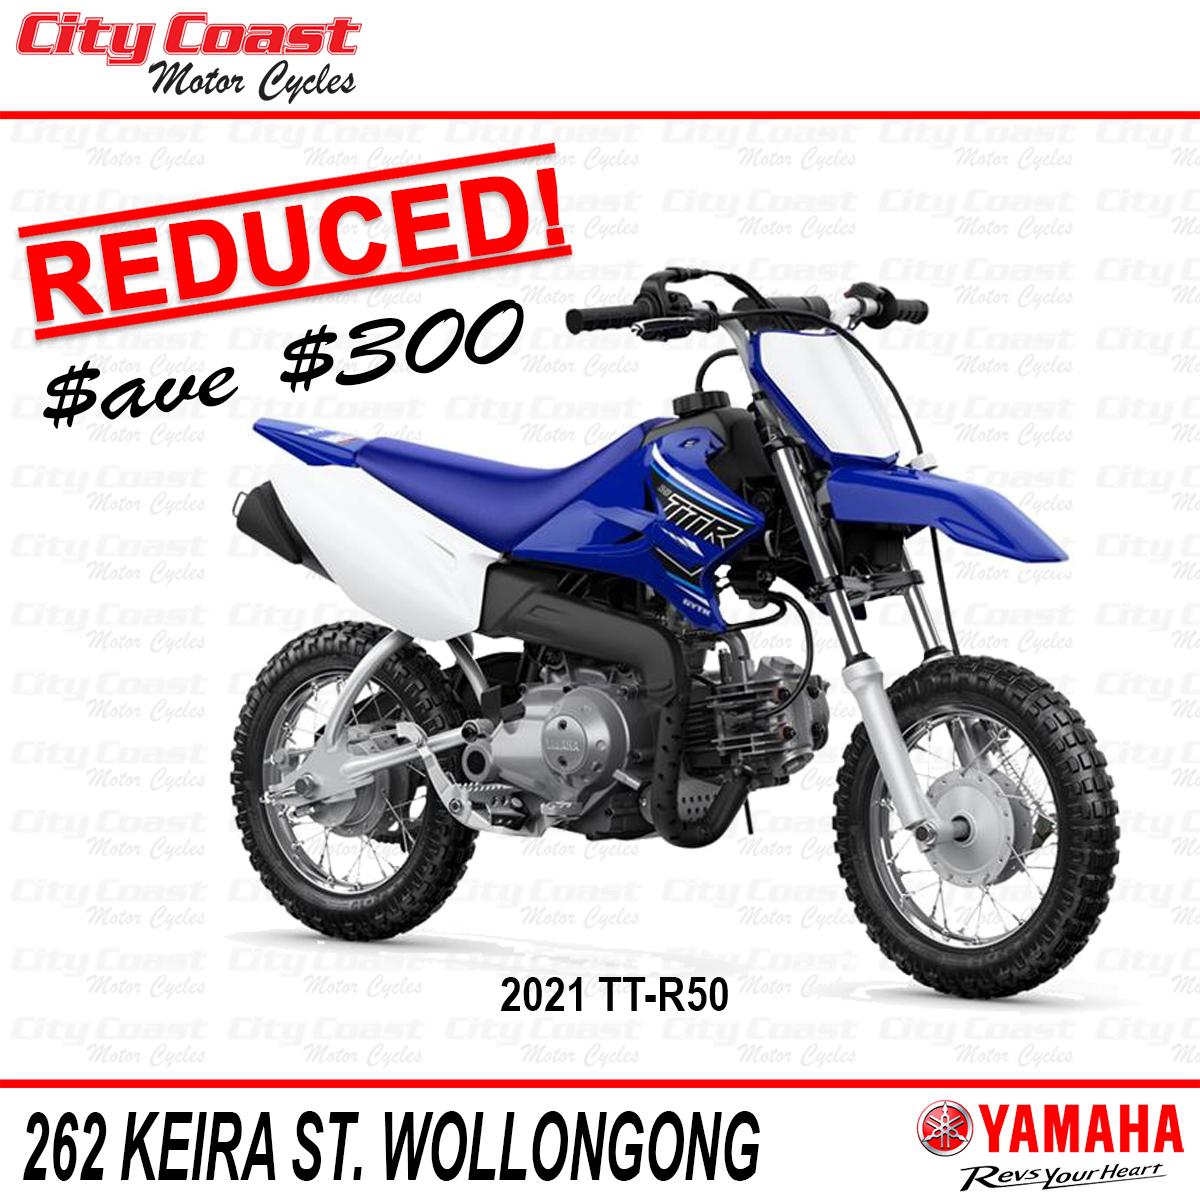 Yamaha TT-R50 on sale!